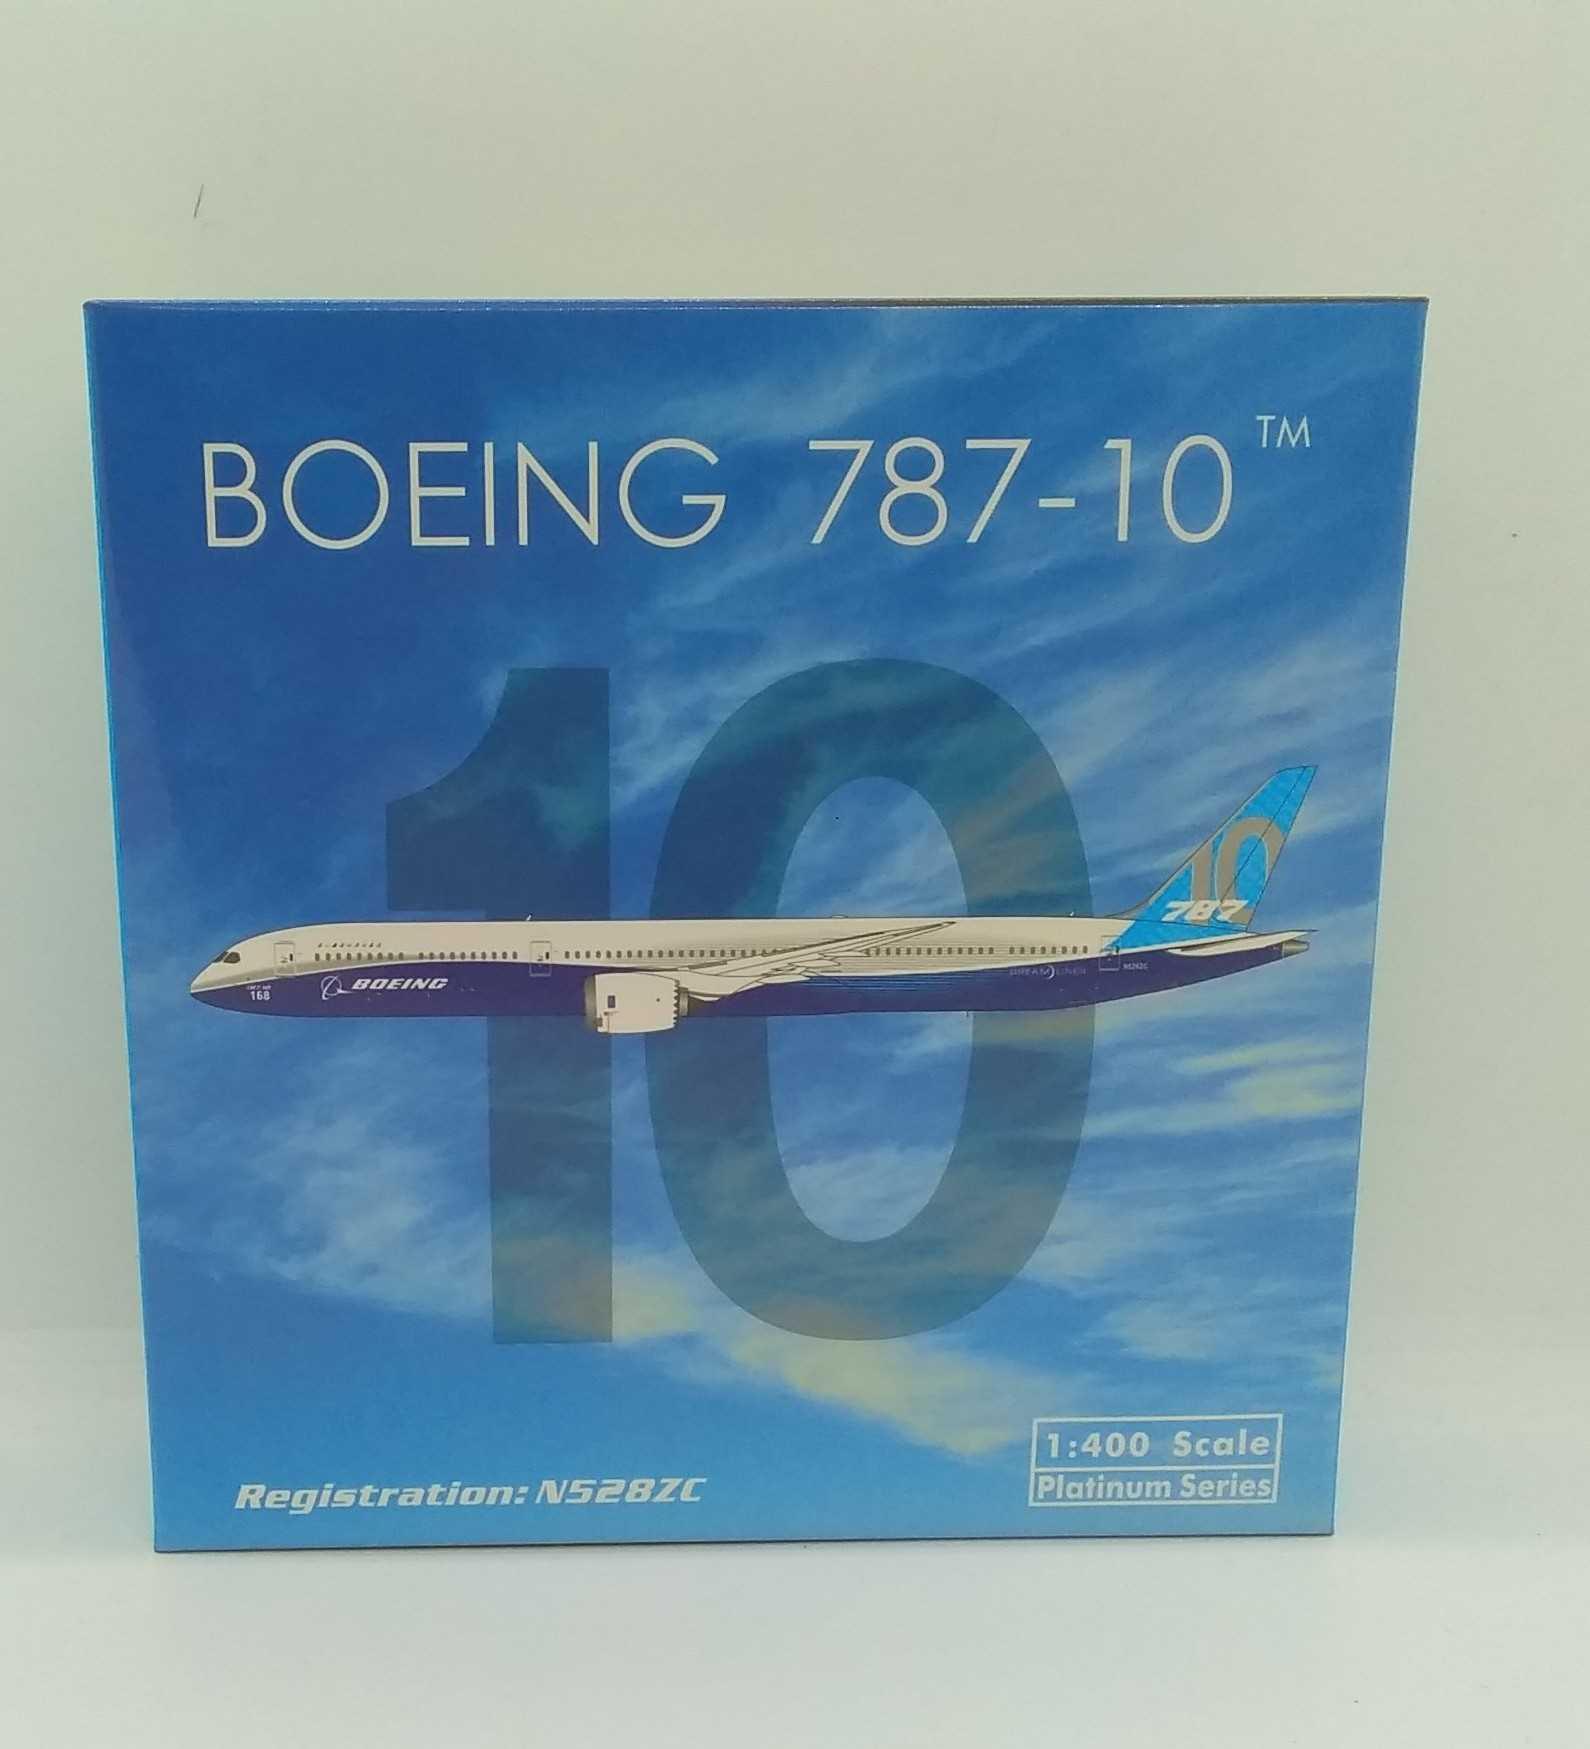 BOEING 787-10|不明